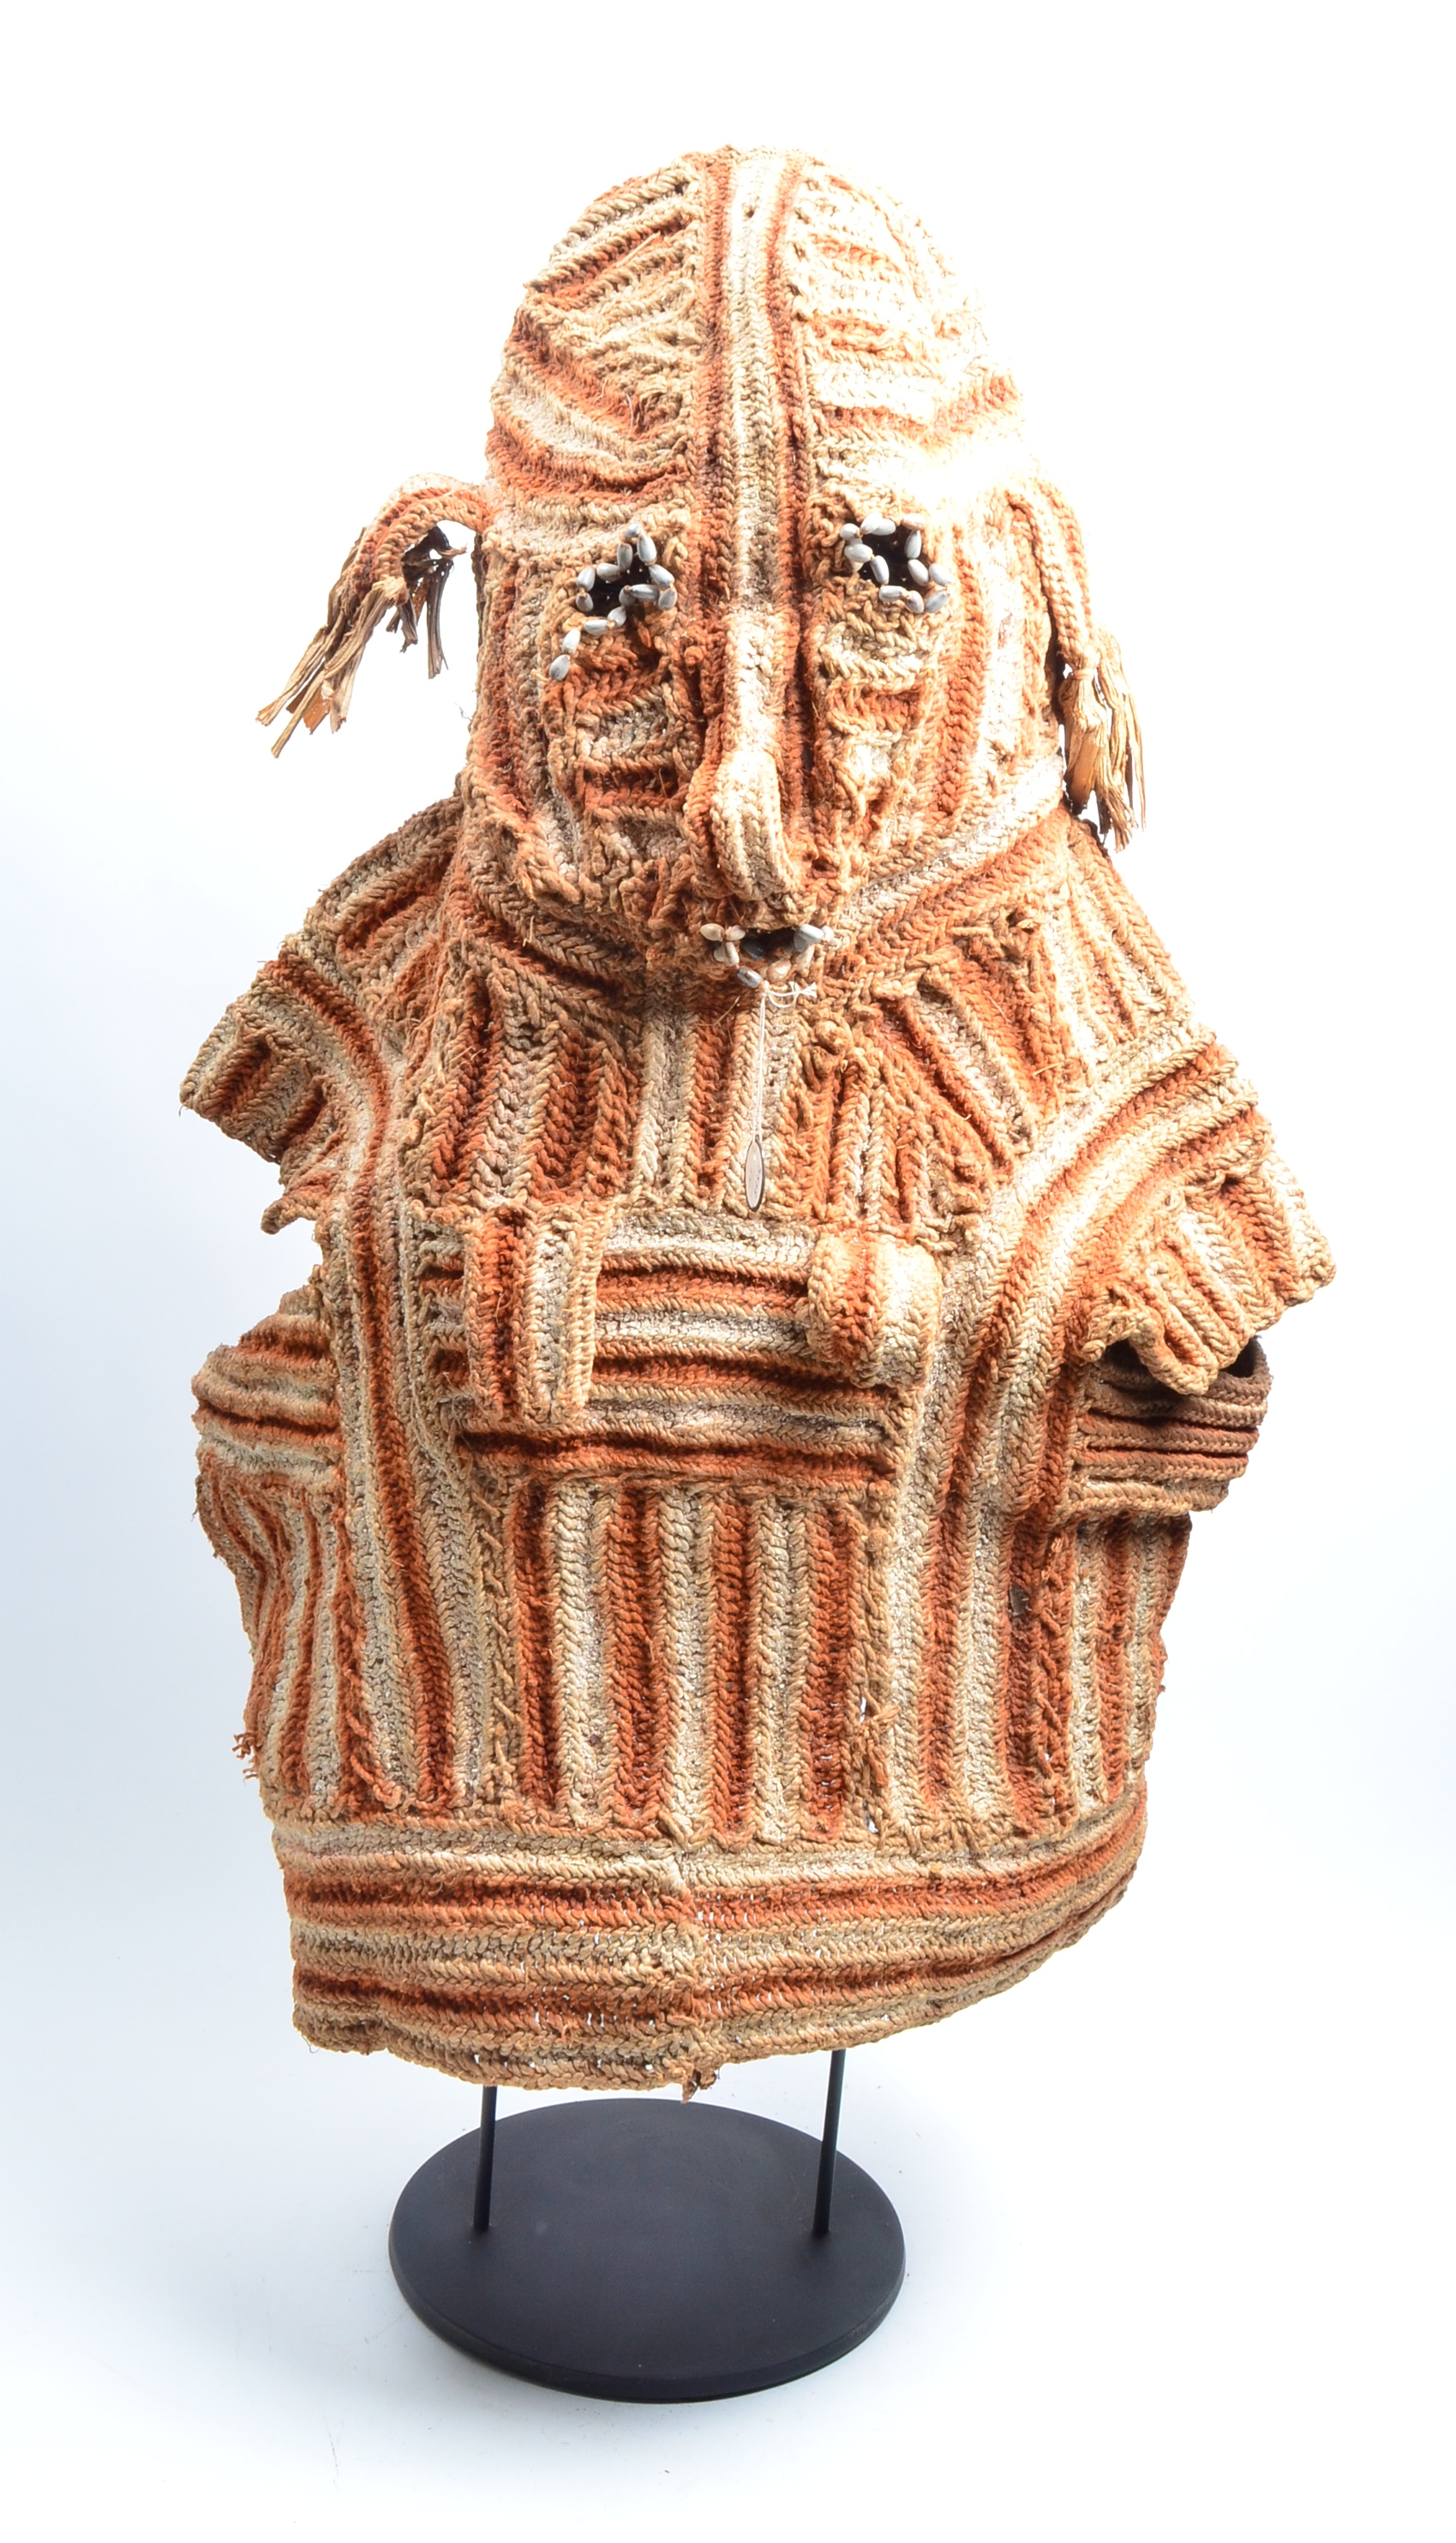 Jipae costume